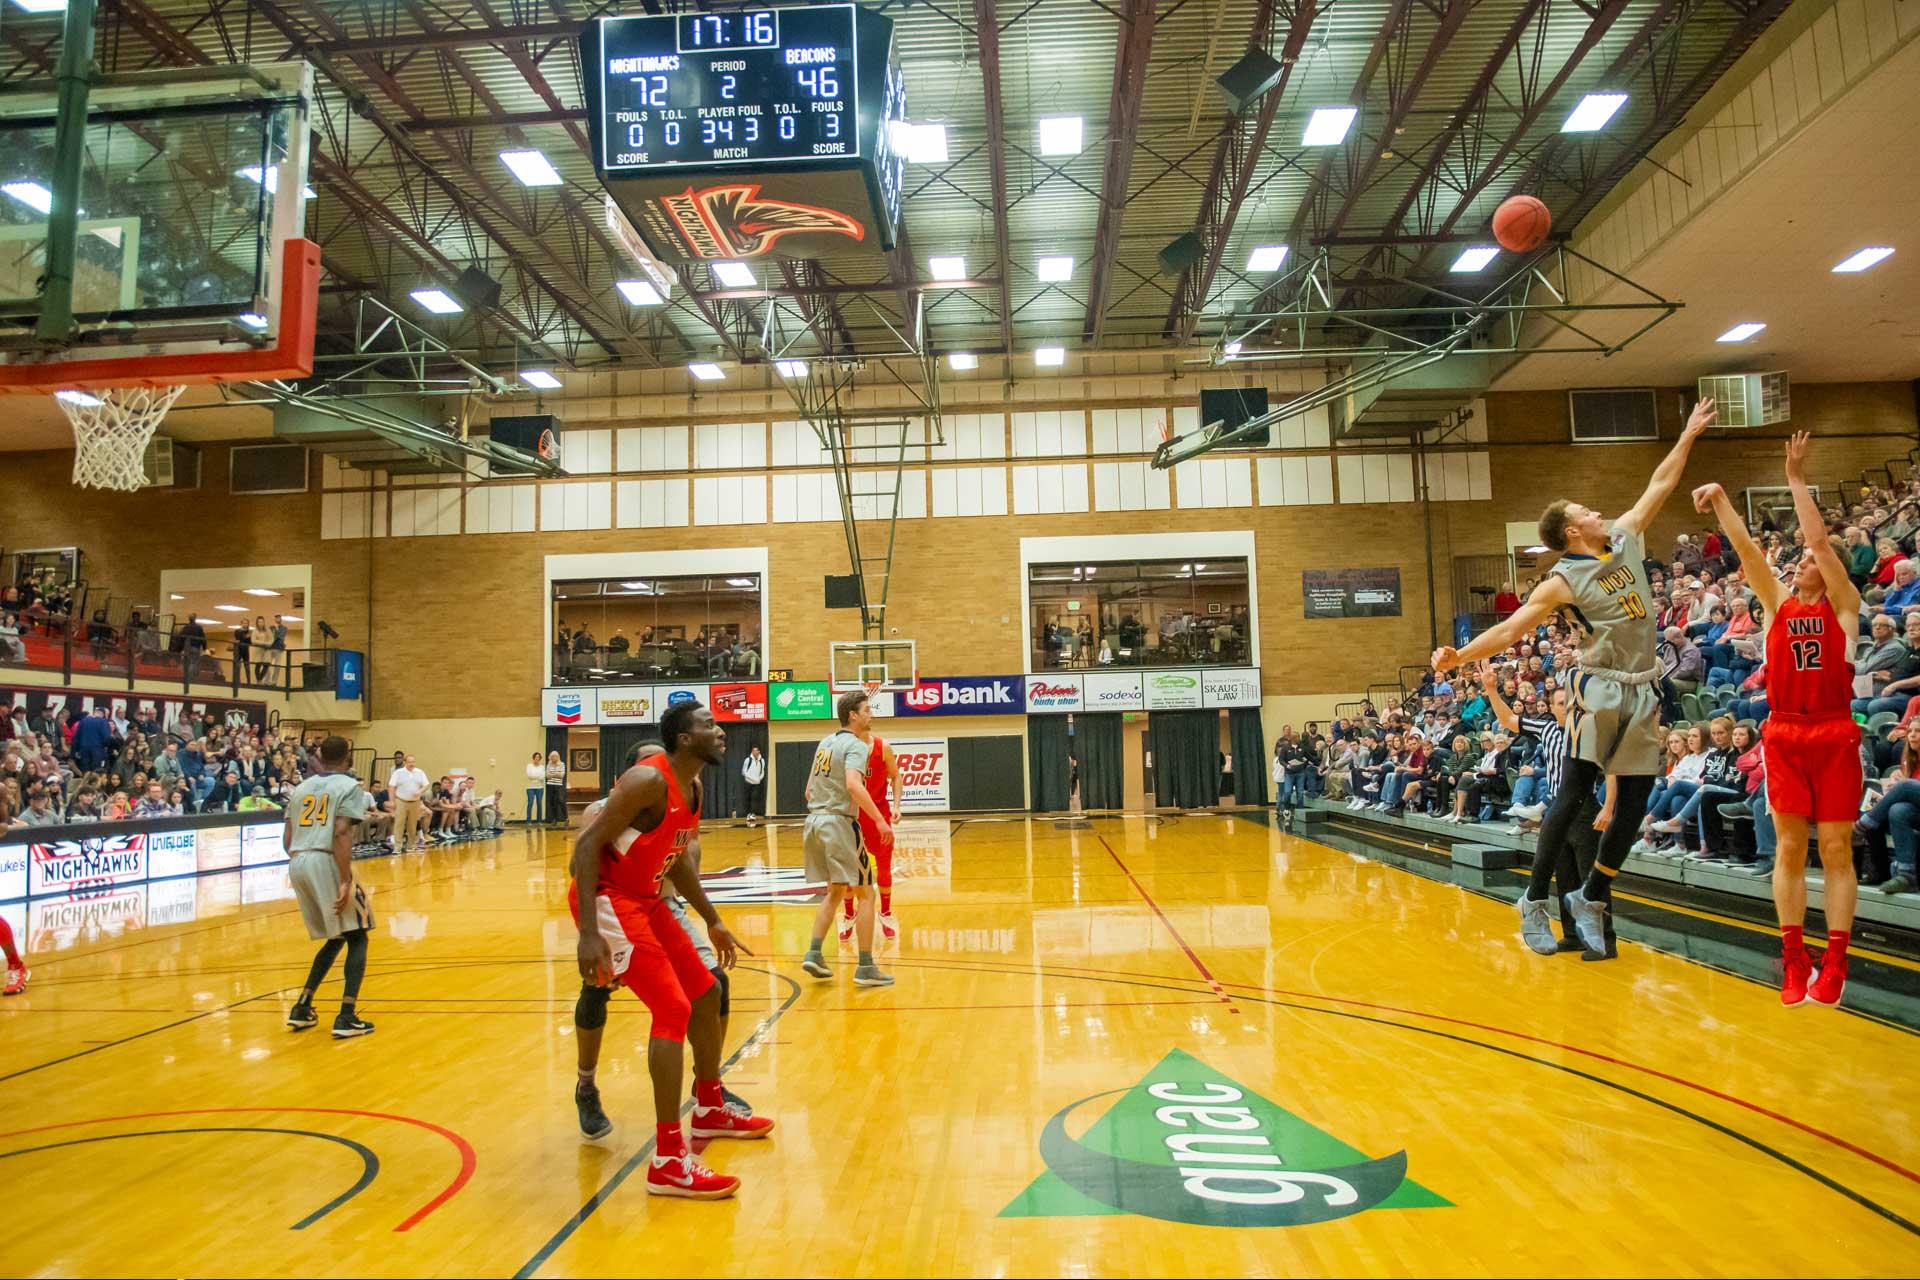 https://www.nnu.edu/sites/default/files/revslider/image/Basketball_Banner.jpg